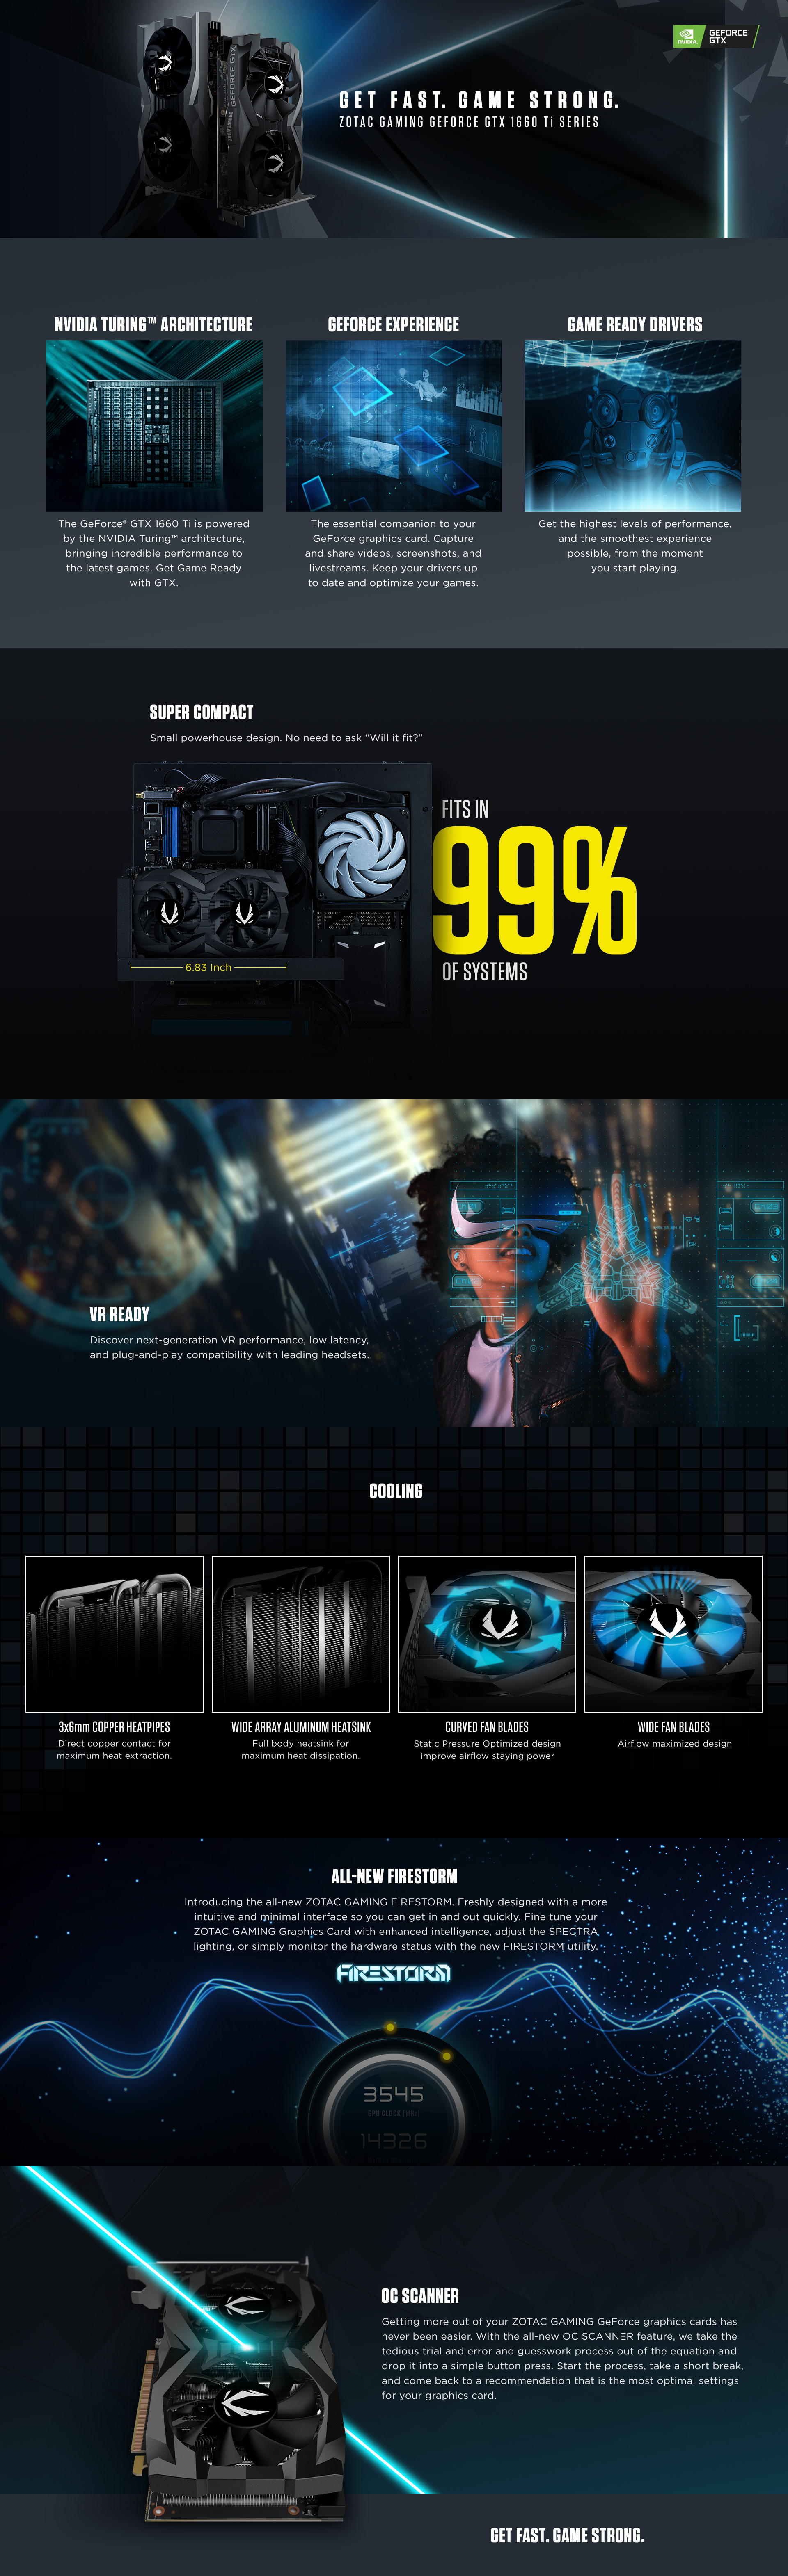 ZOTAC GAMING GeForce GTX 1660 Ti 6GB GDDR6 | ZOTAC